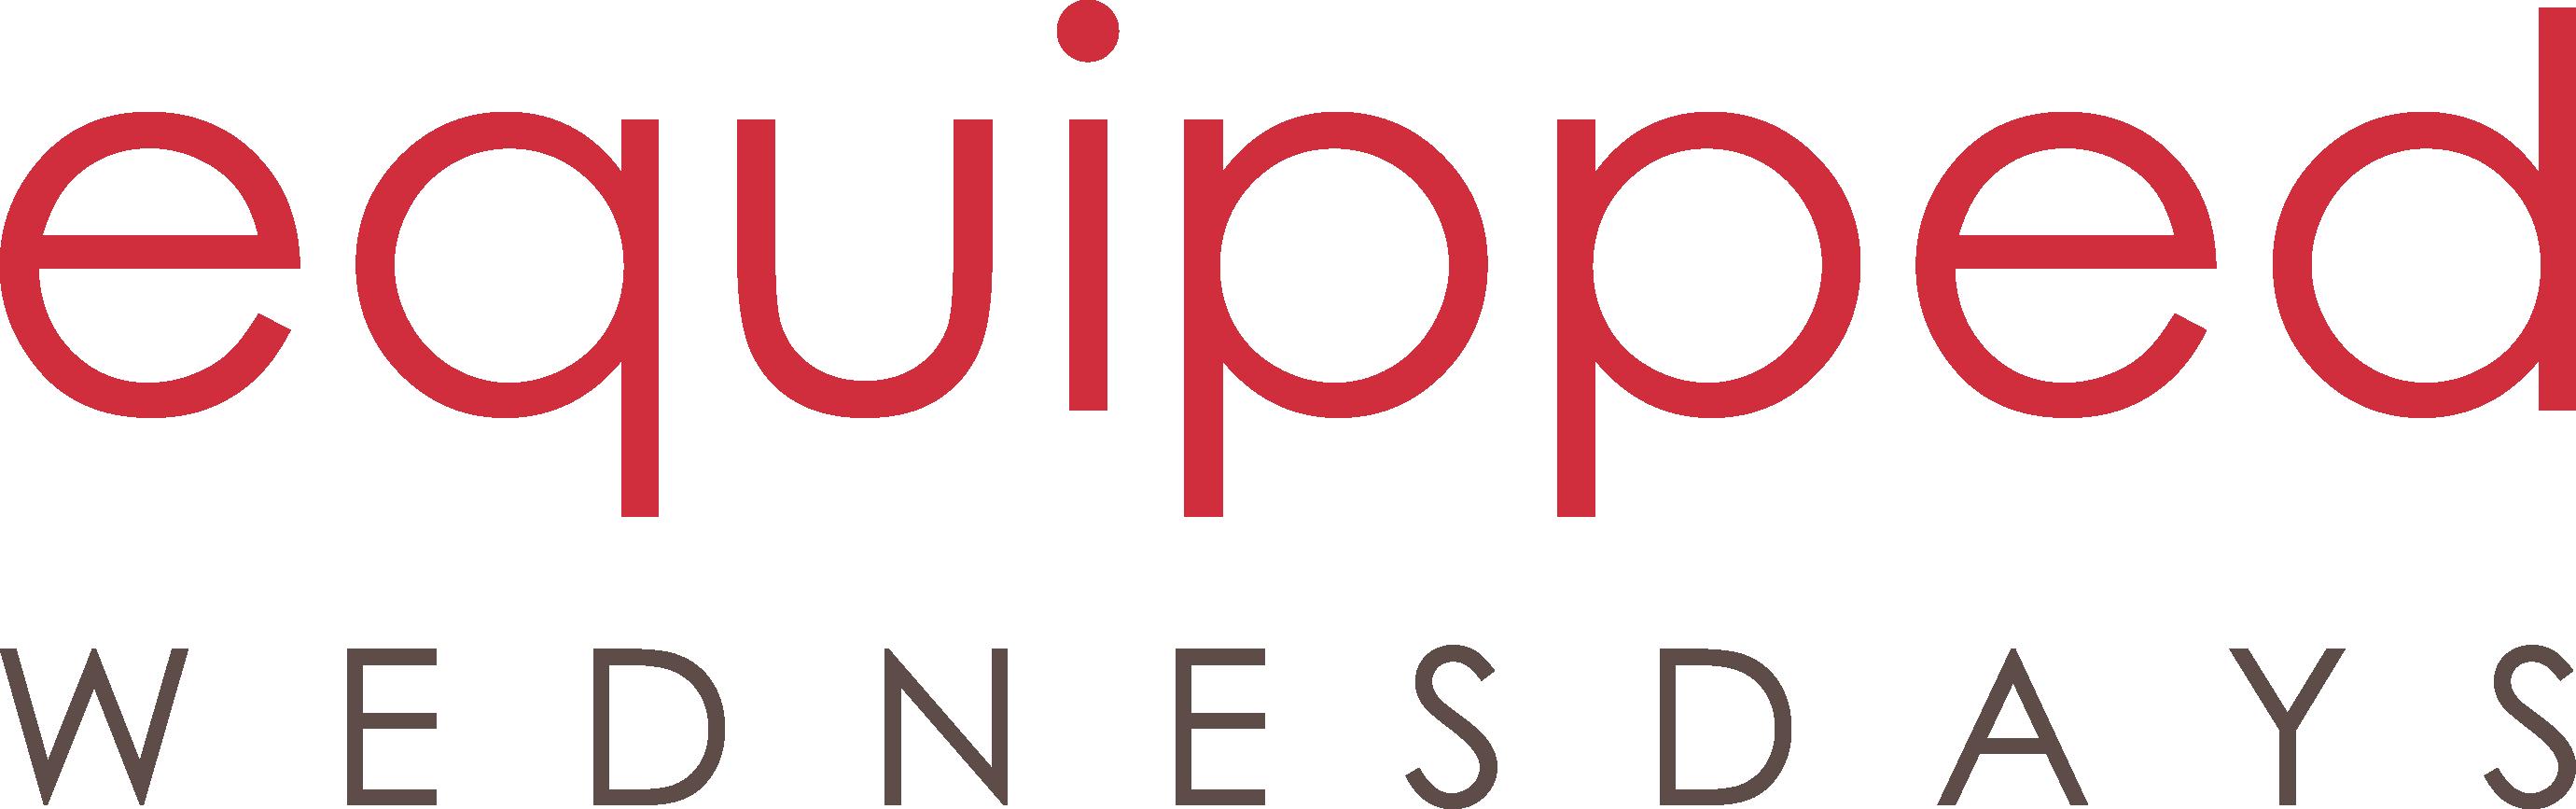 Logo - Equipped Wednesdays